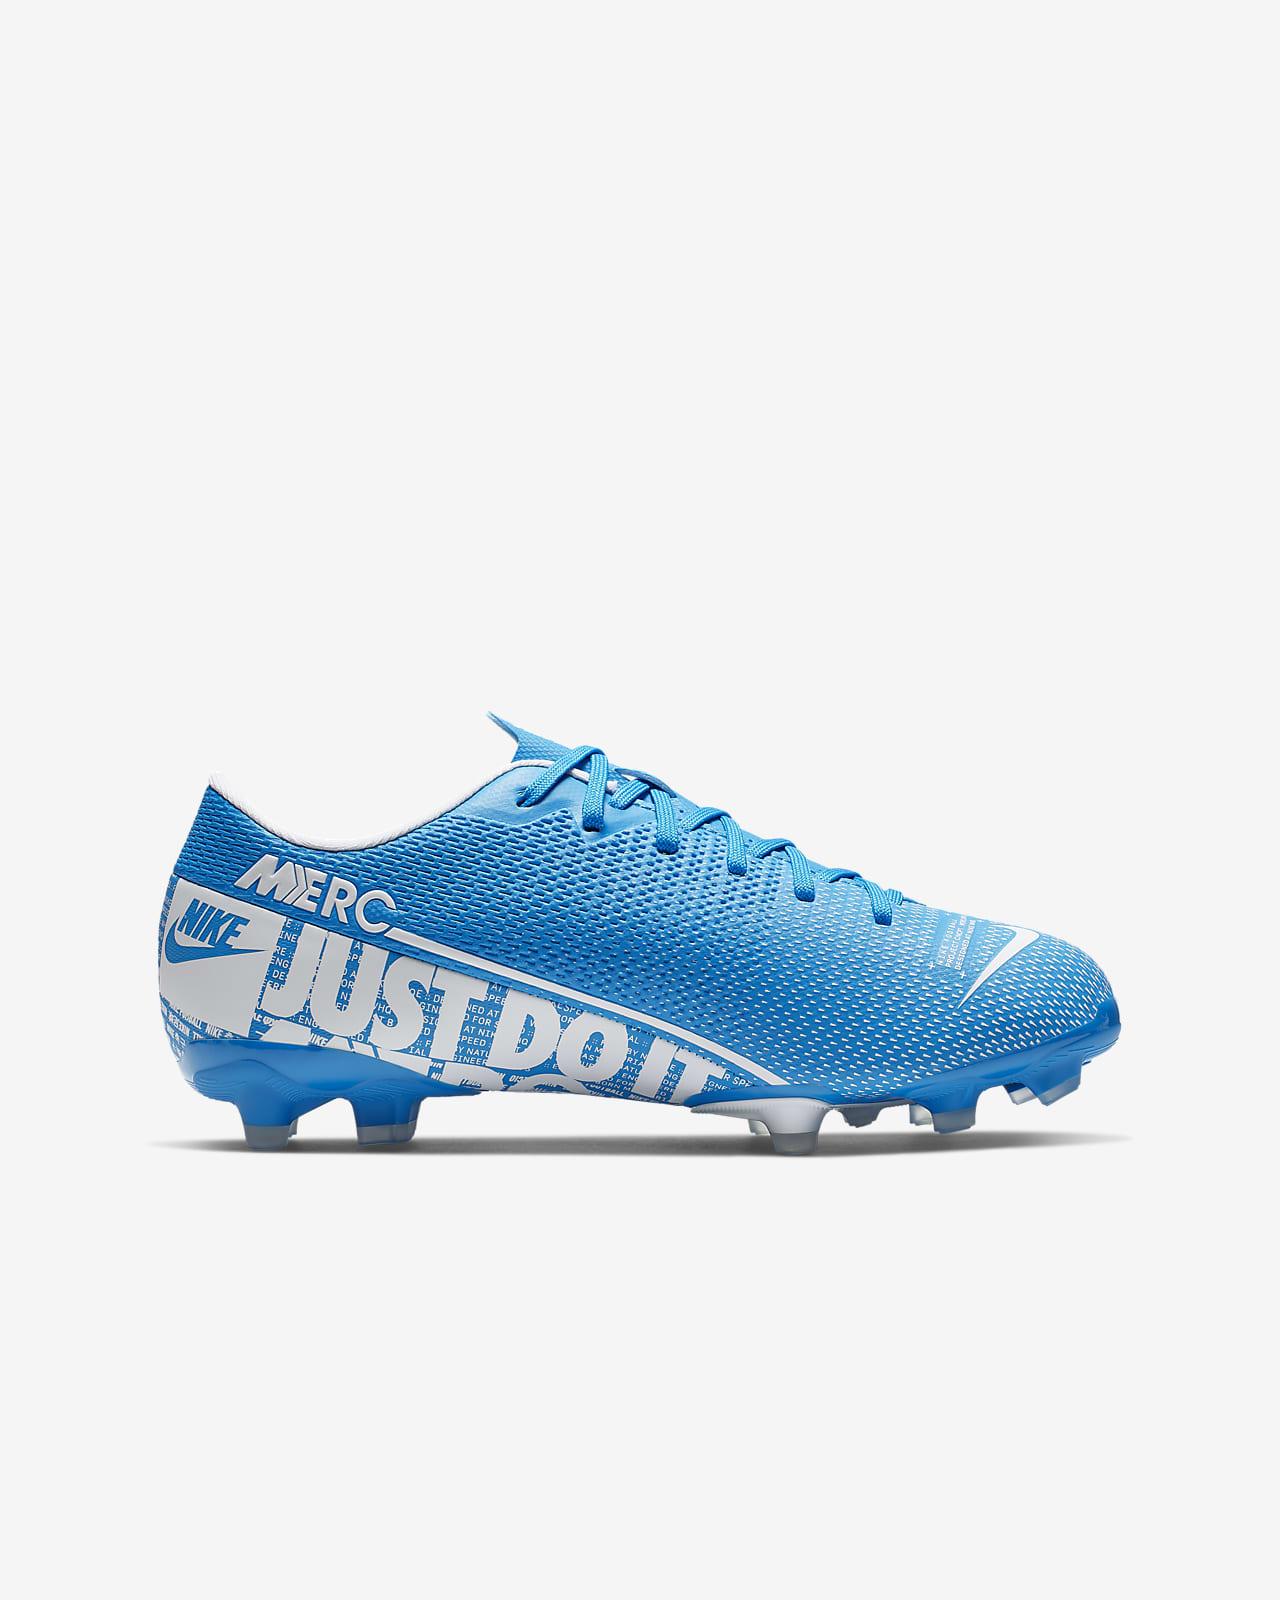 chaussure de foot enfant nike bleu